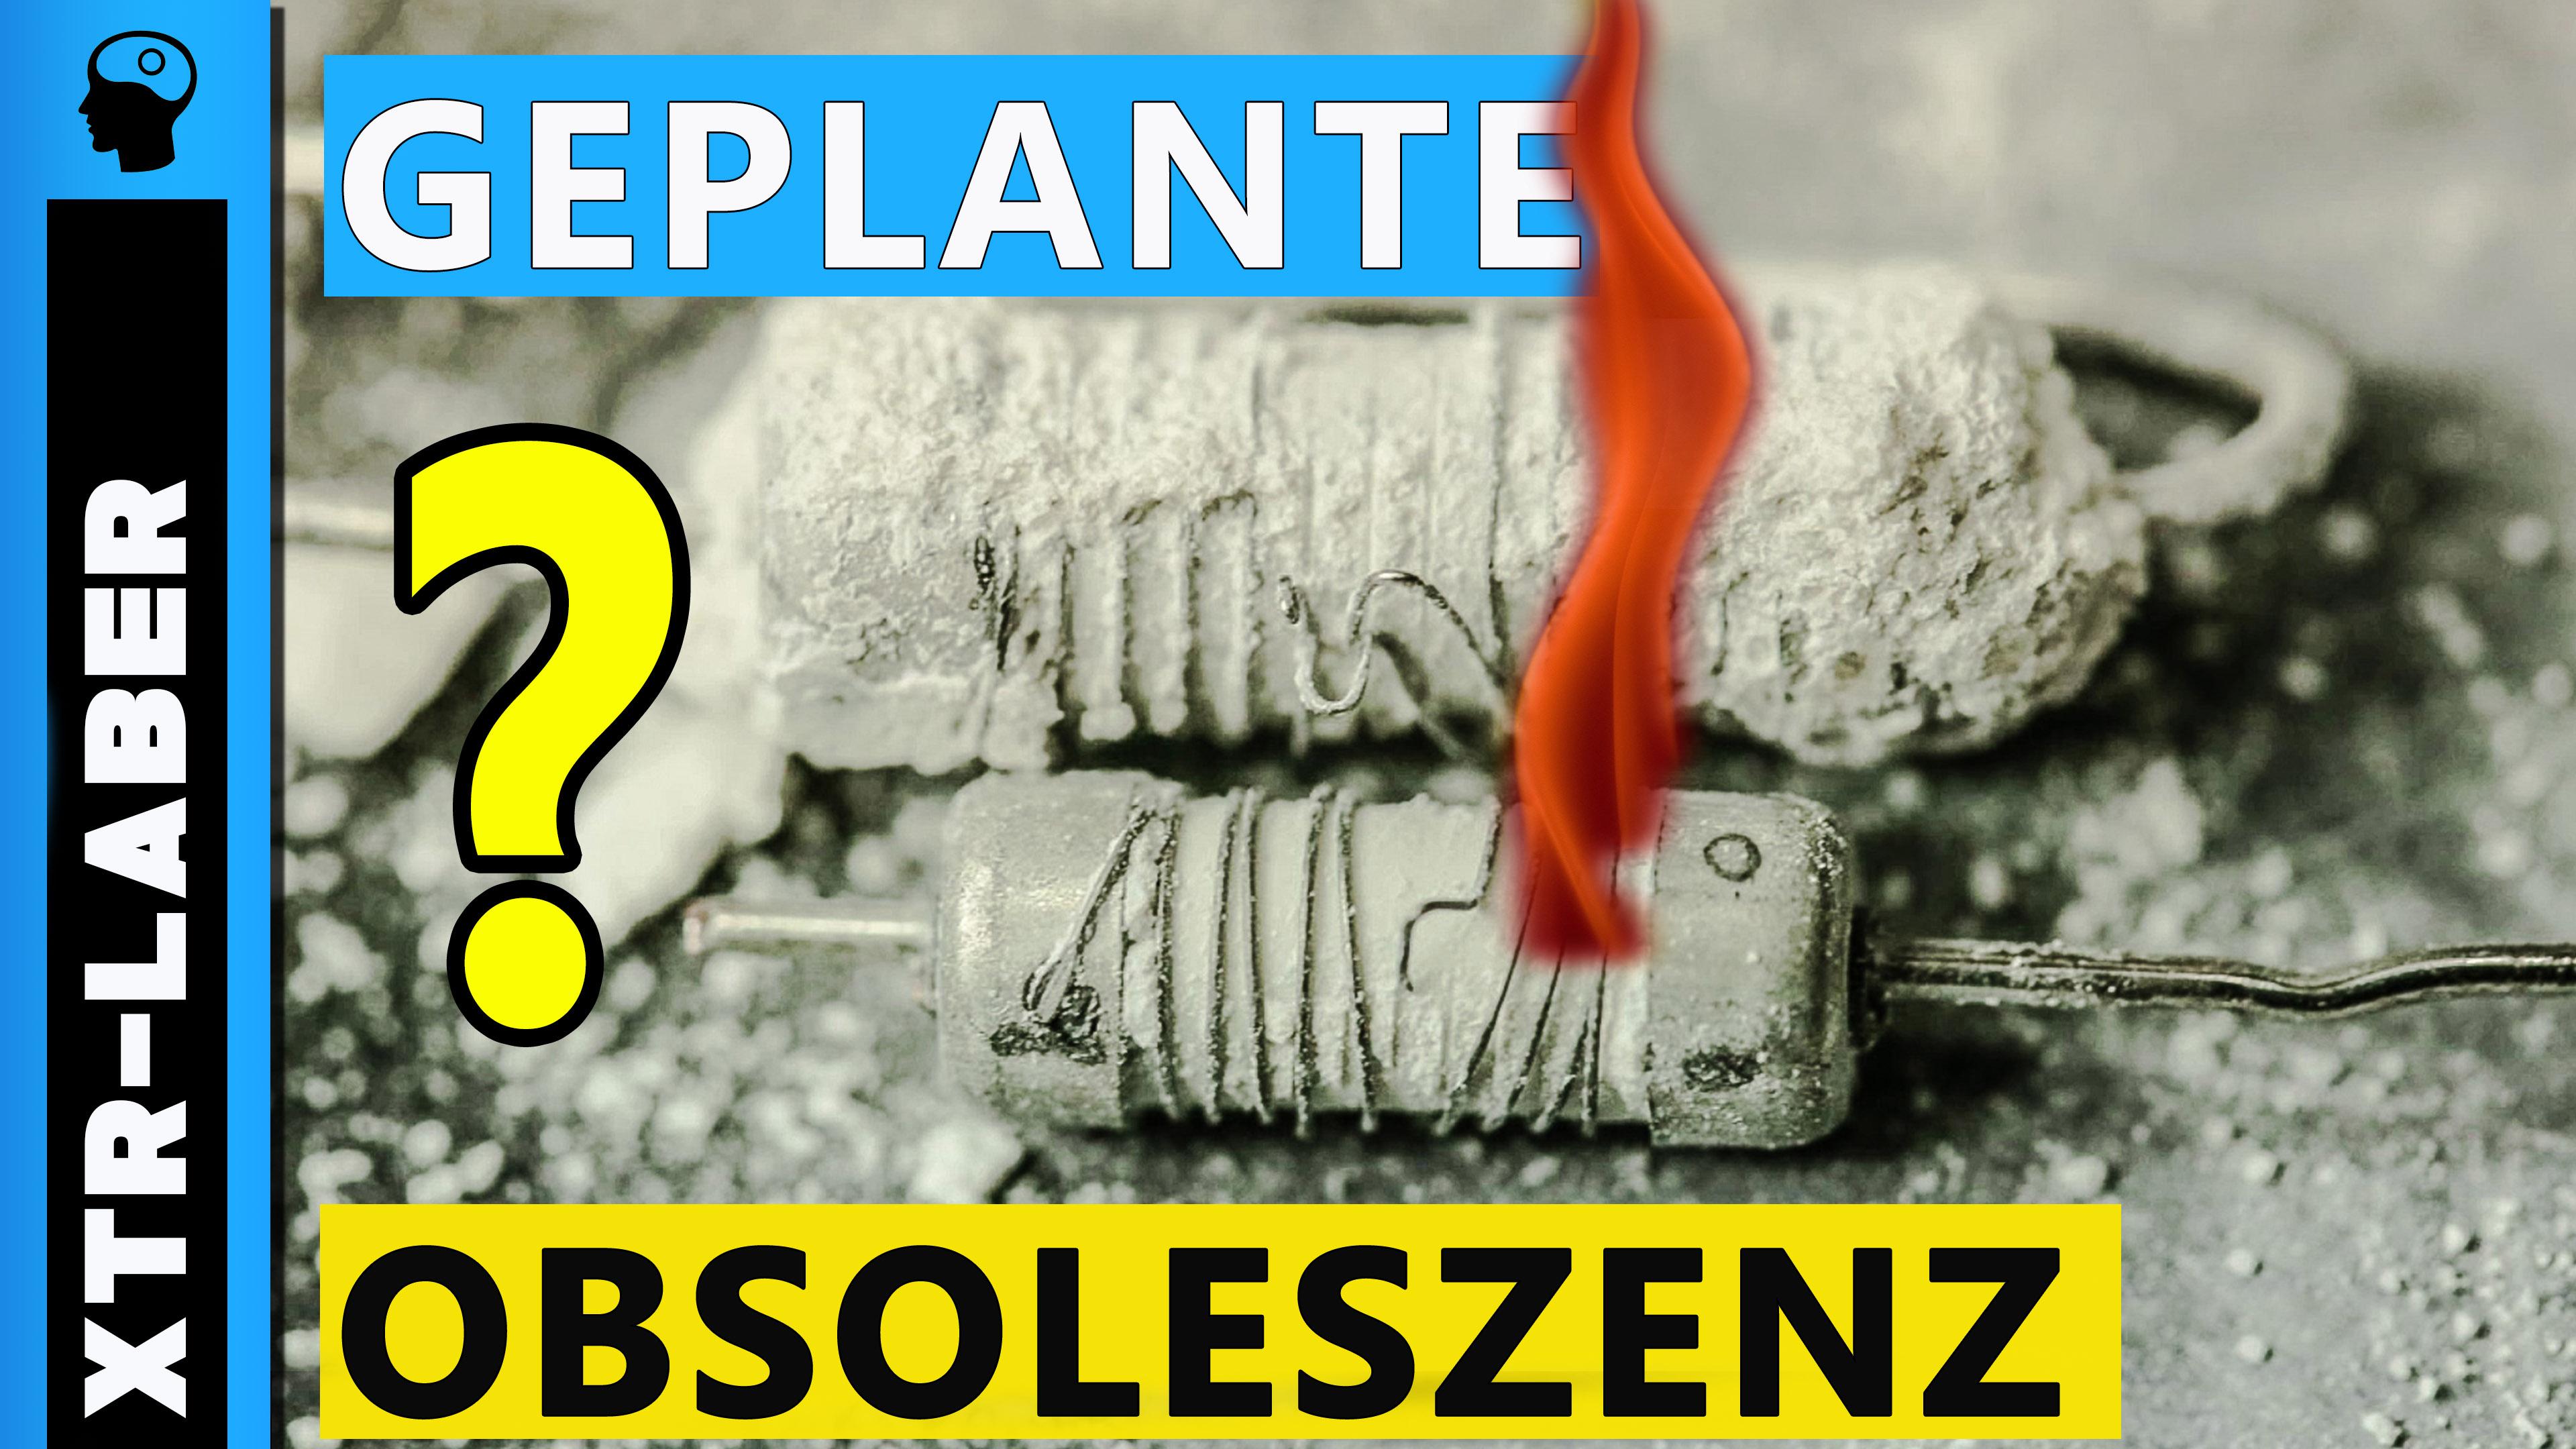 11 Geplante Obsoleszenz show art